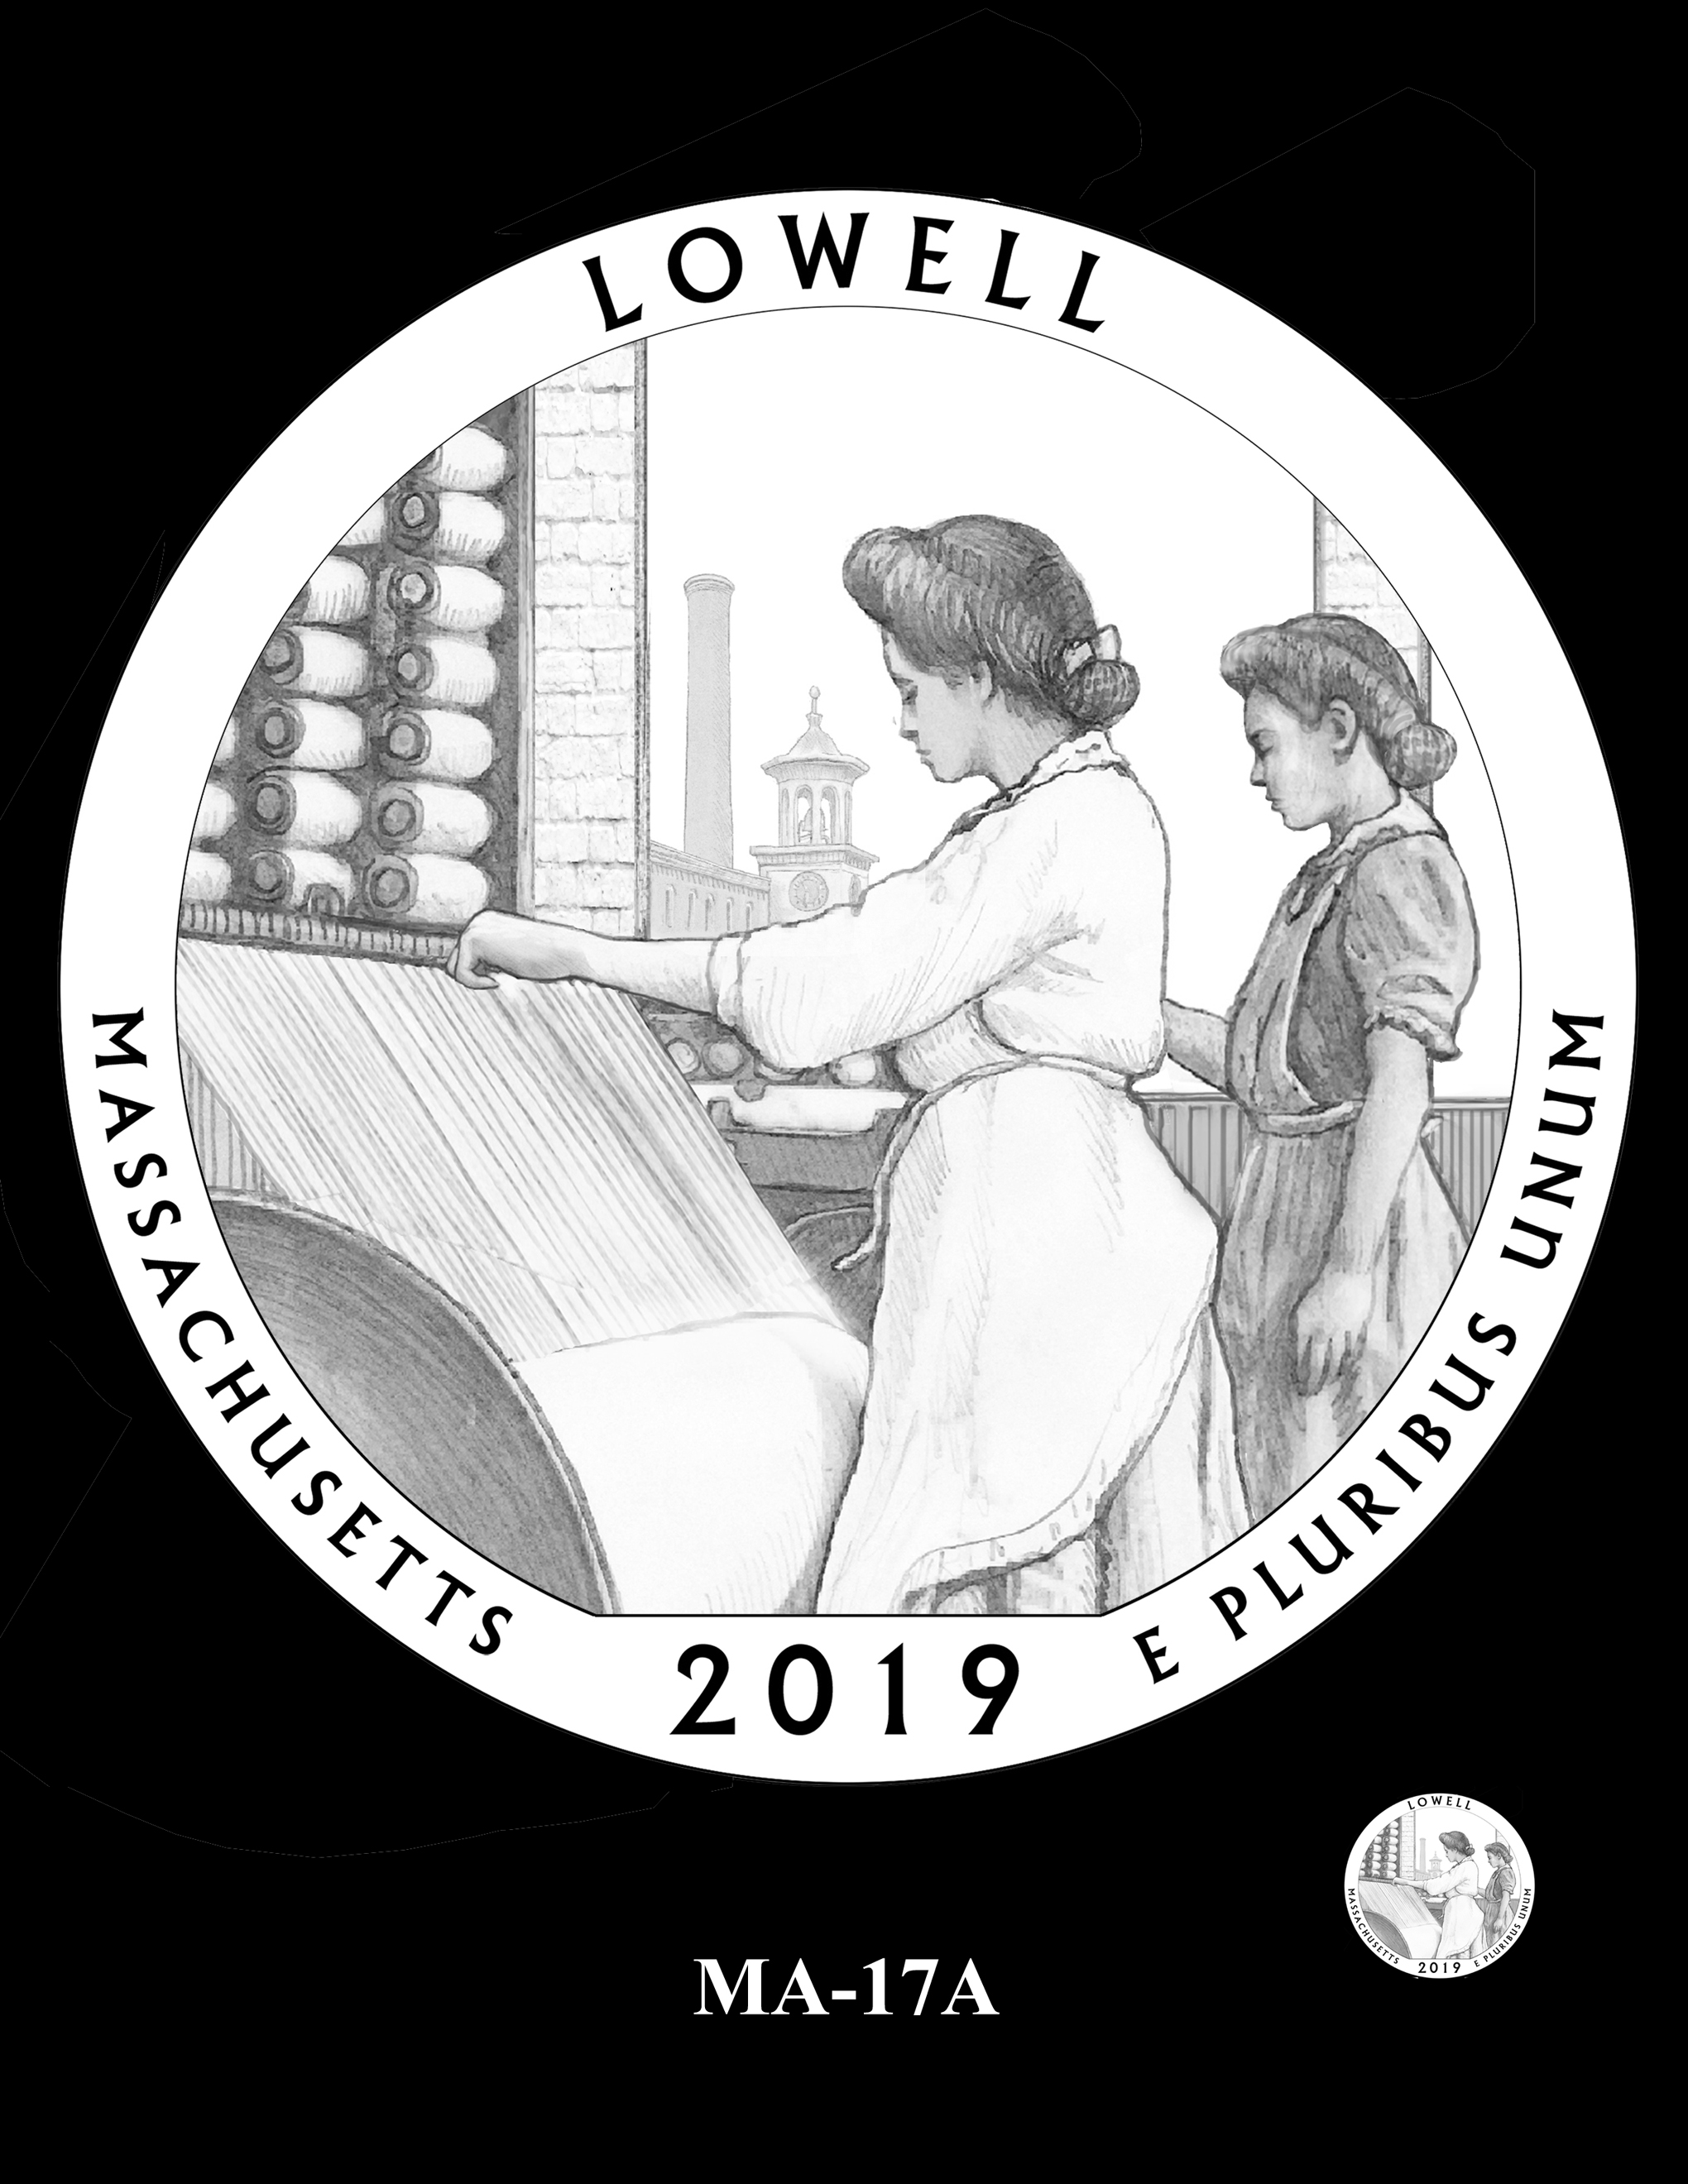 MA-17A -- 2019 America the Beautiful Quarters® Program